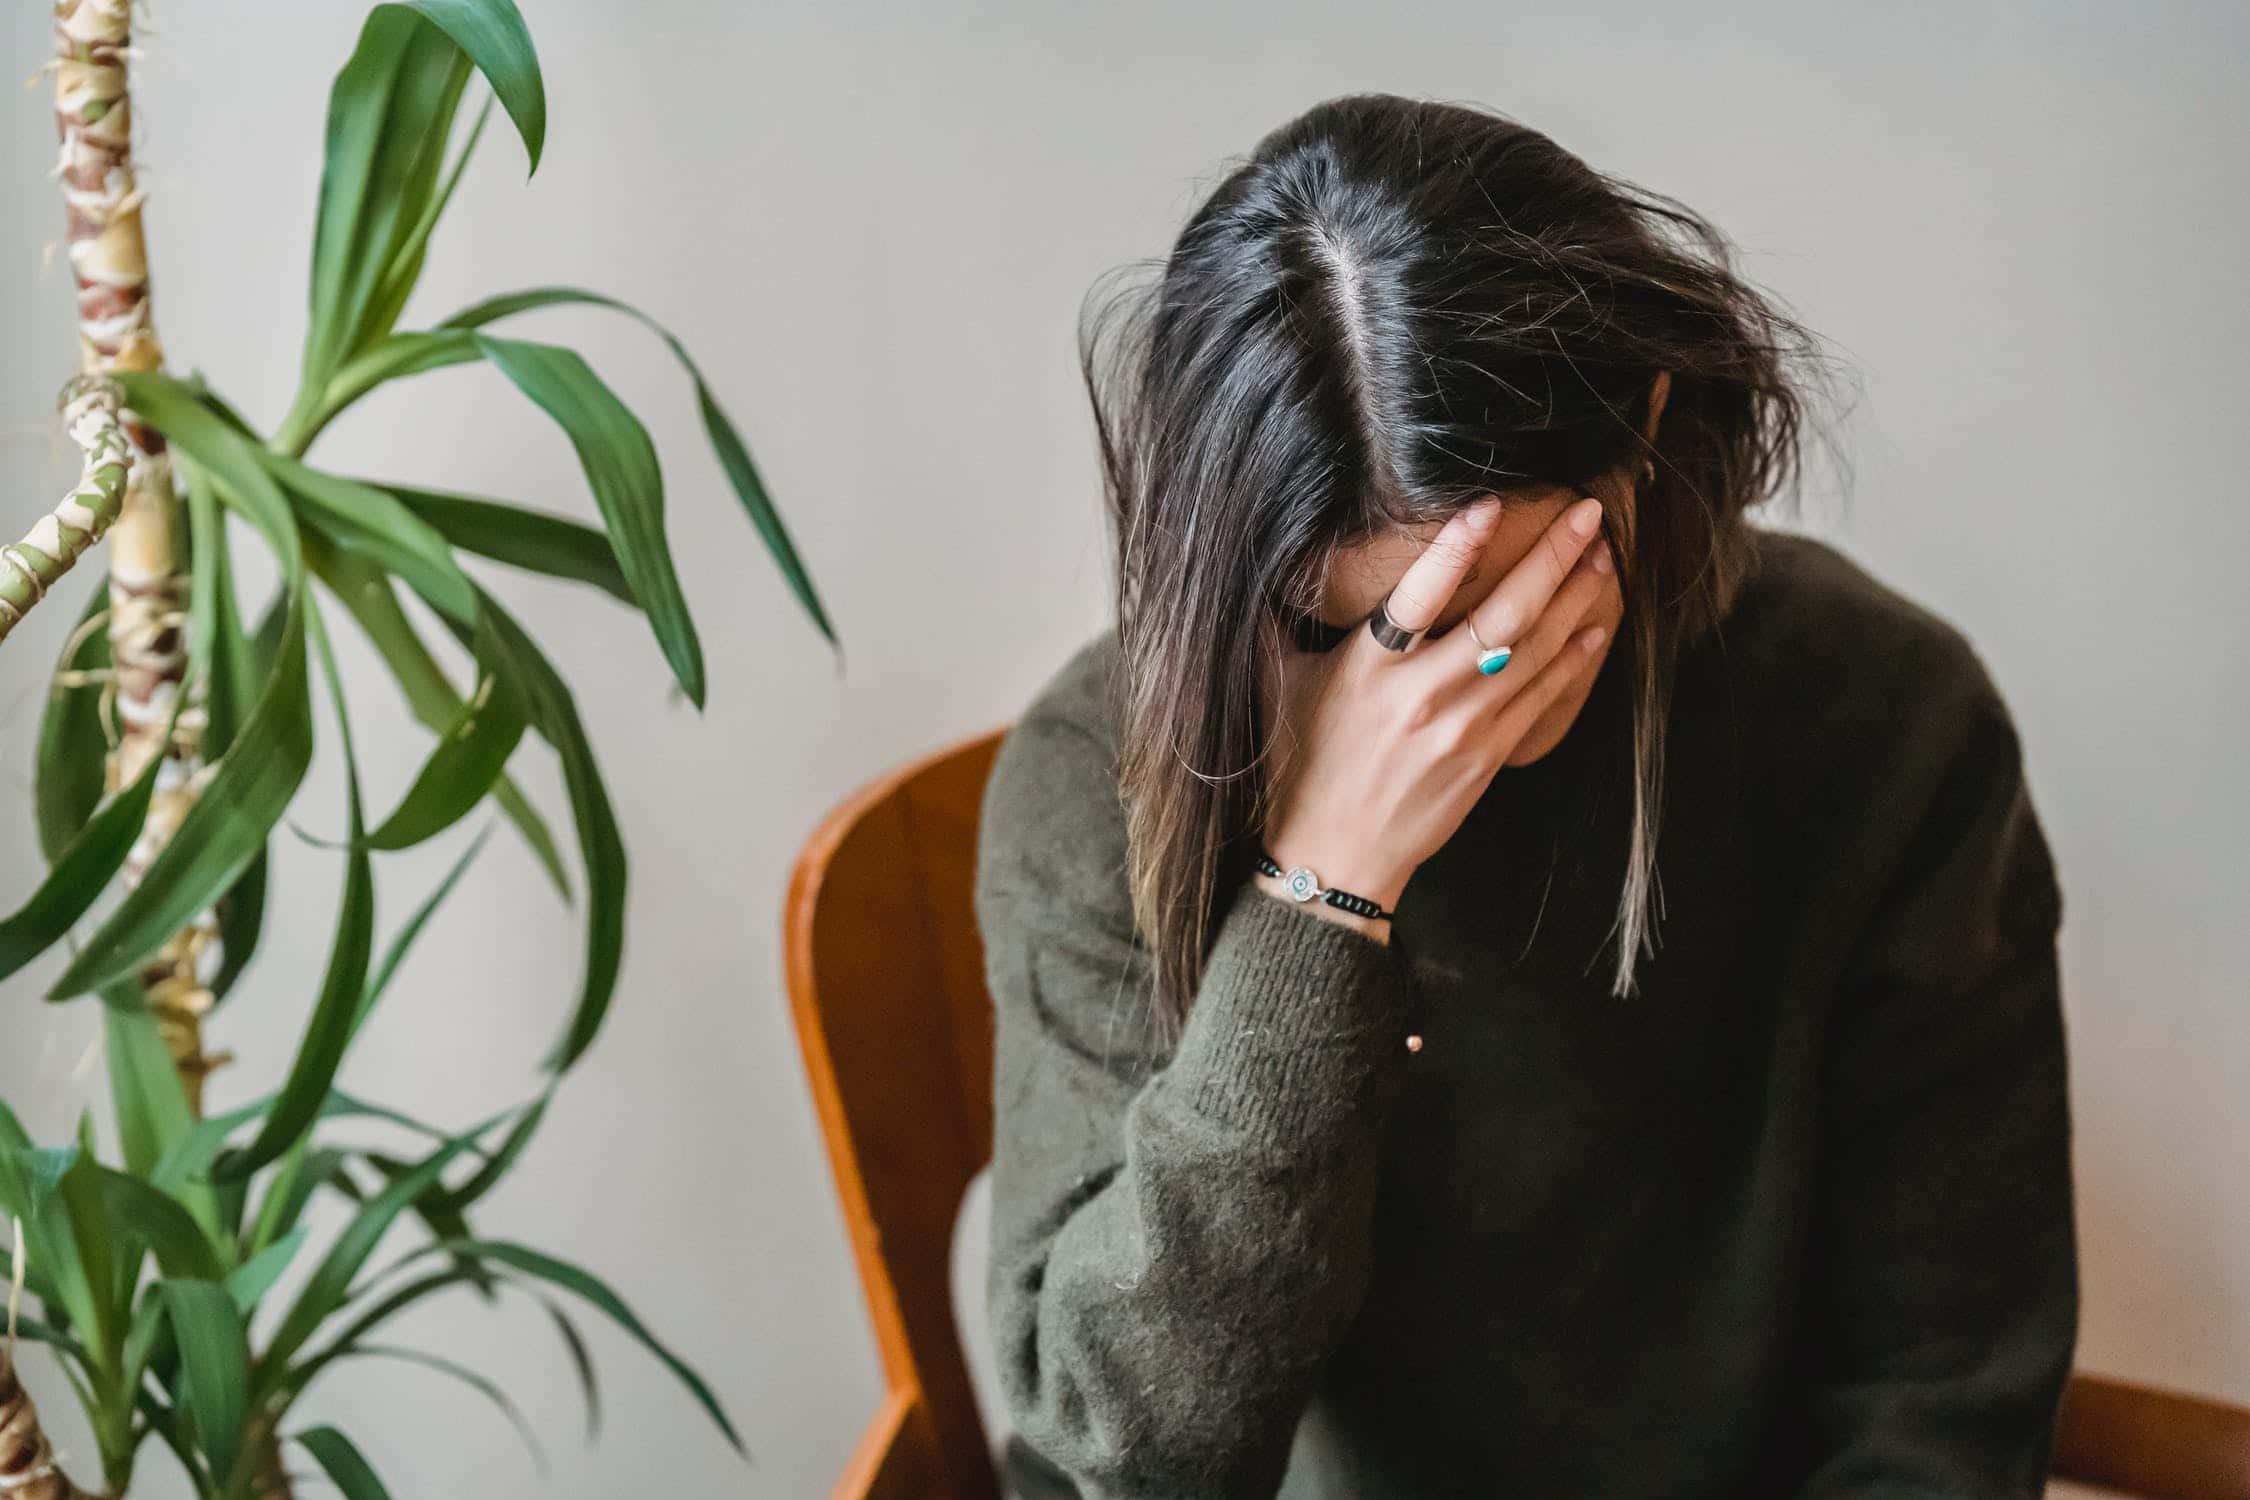 Overthinking disorder treatment options